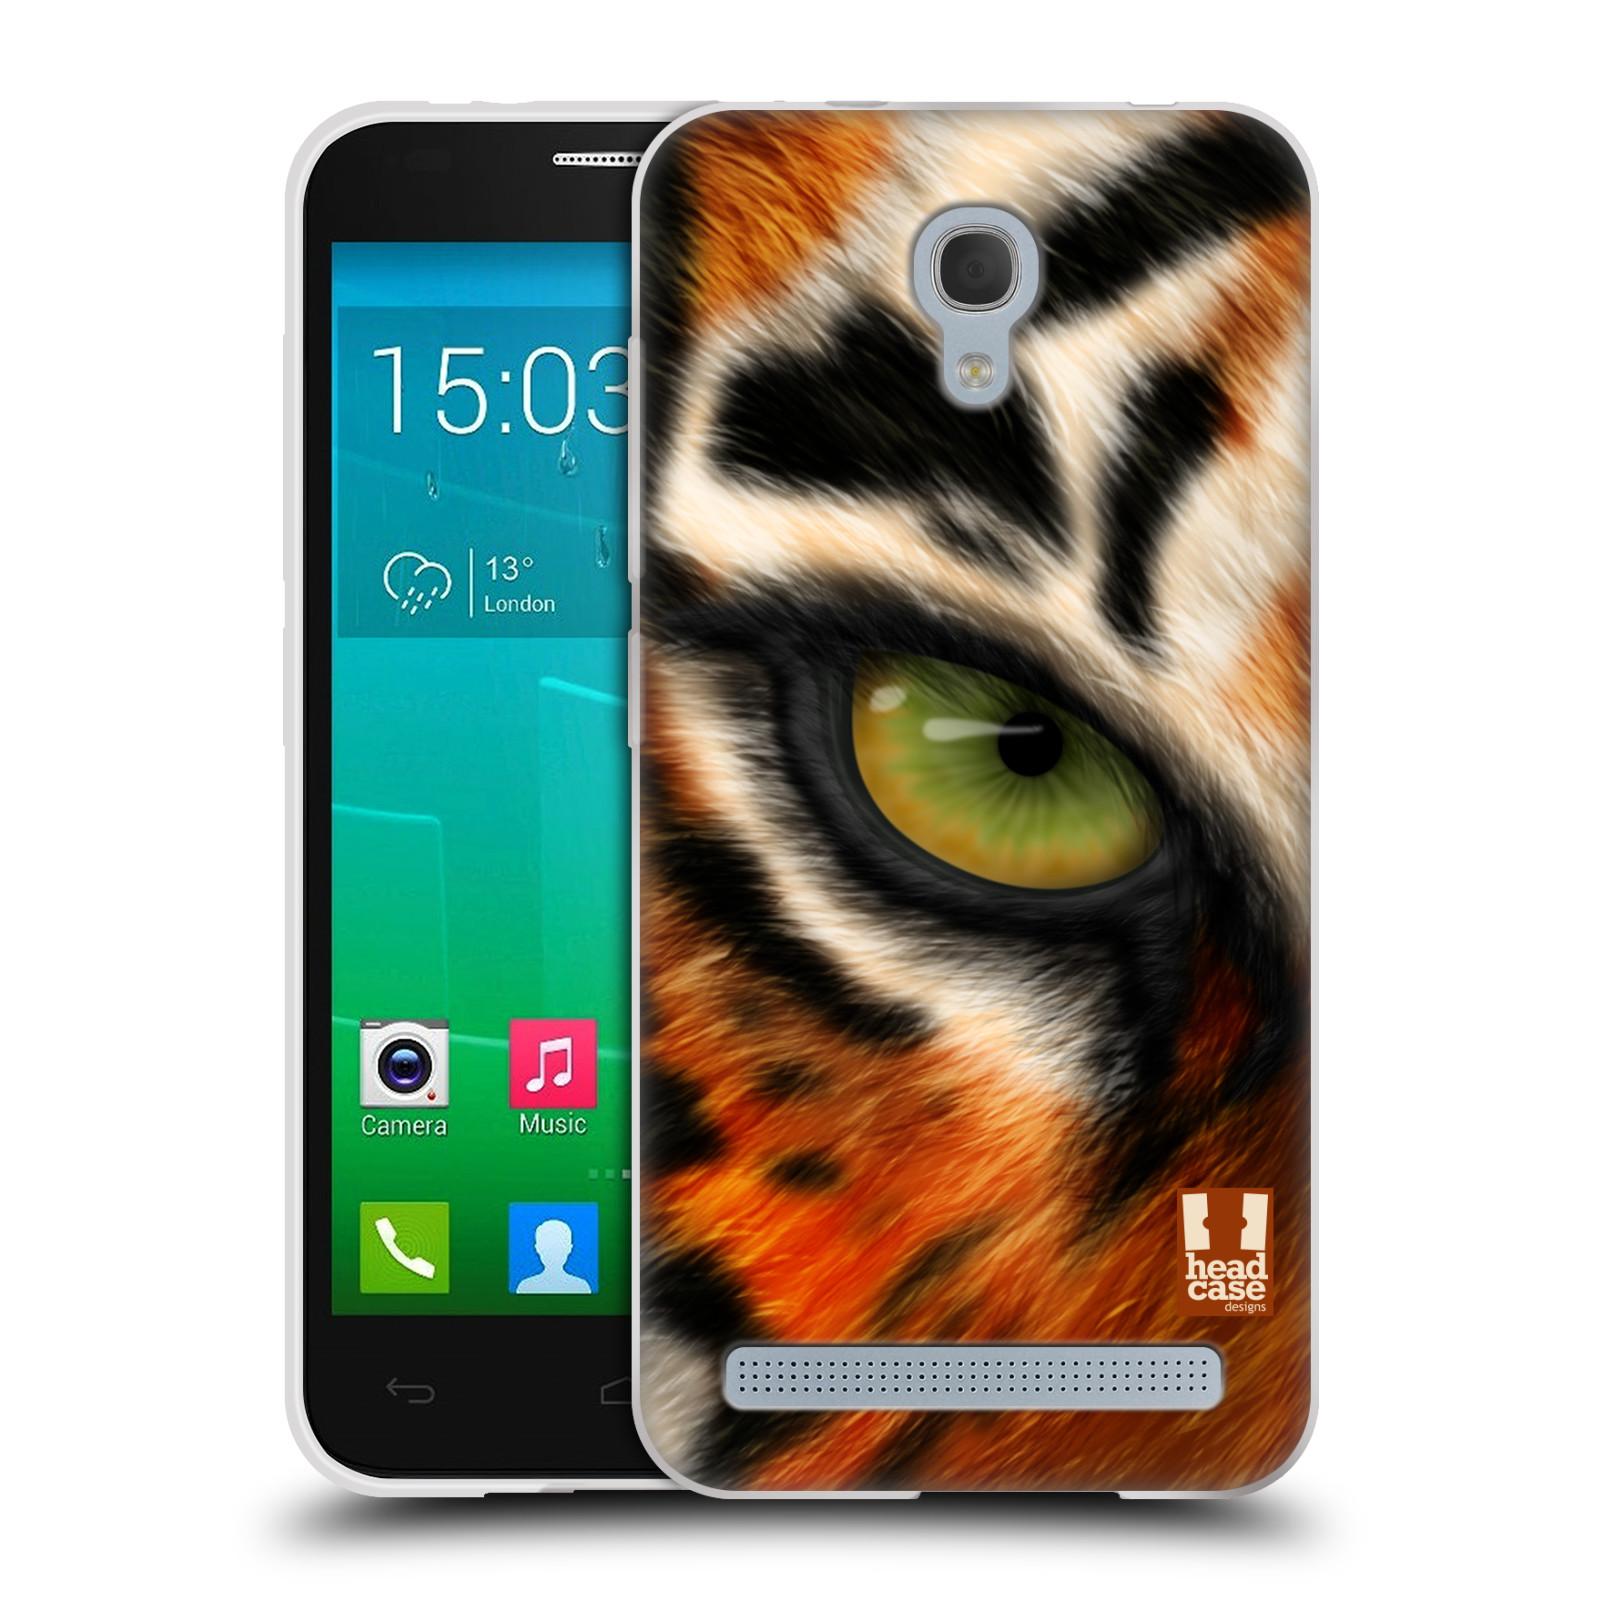 HEAD CASE silikonový obal na mobil Alcatel Idol 2 MINI S 6036Y vzor pohled zvířete oko tygr